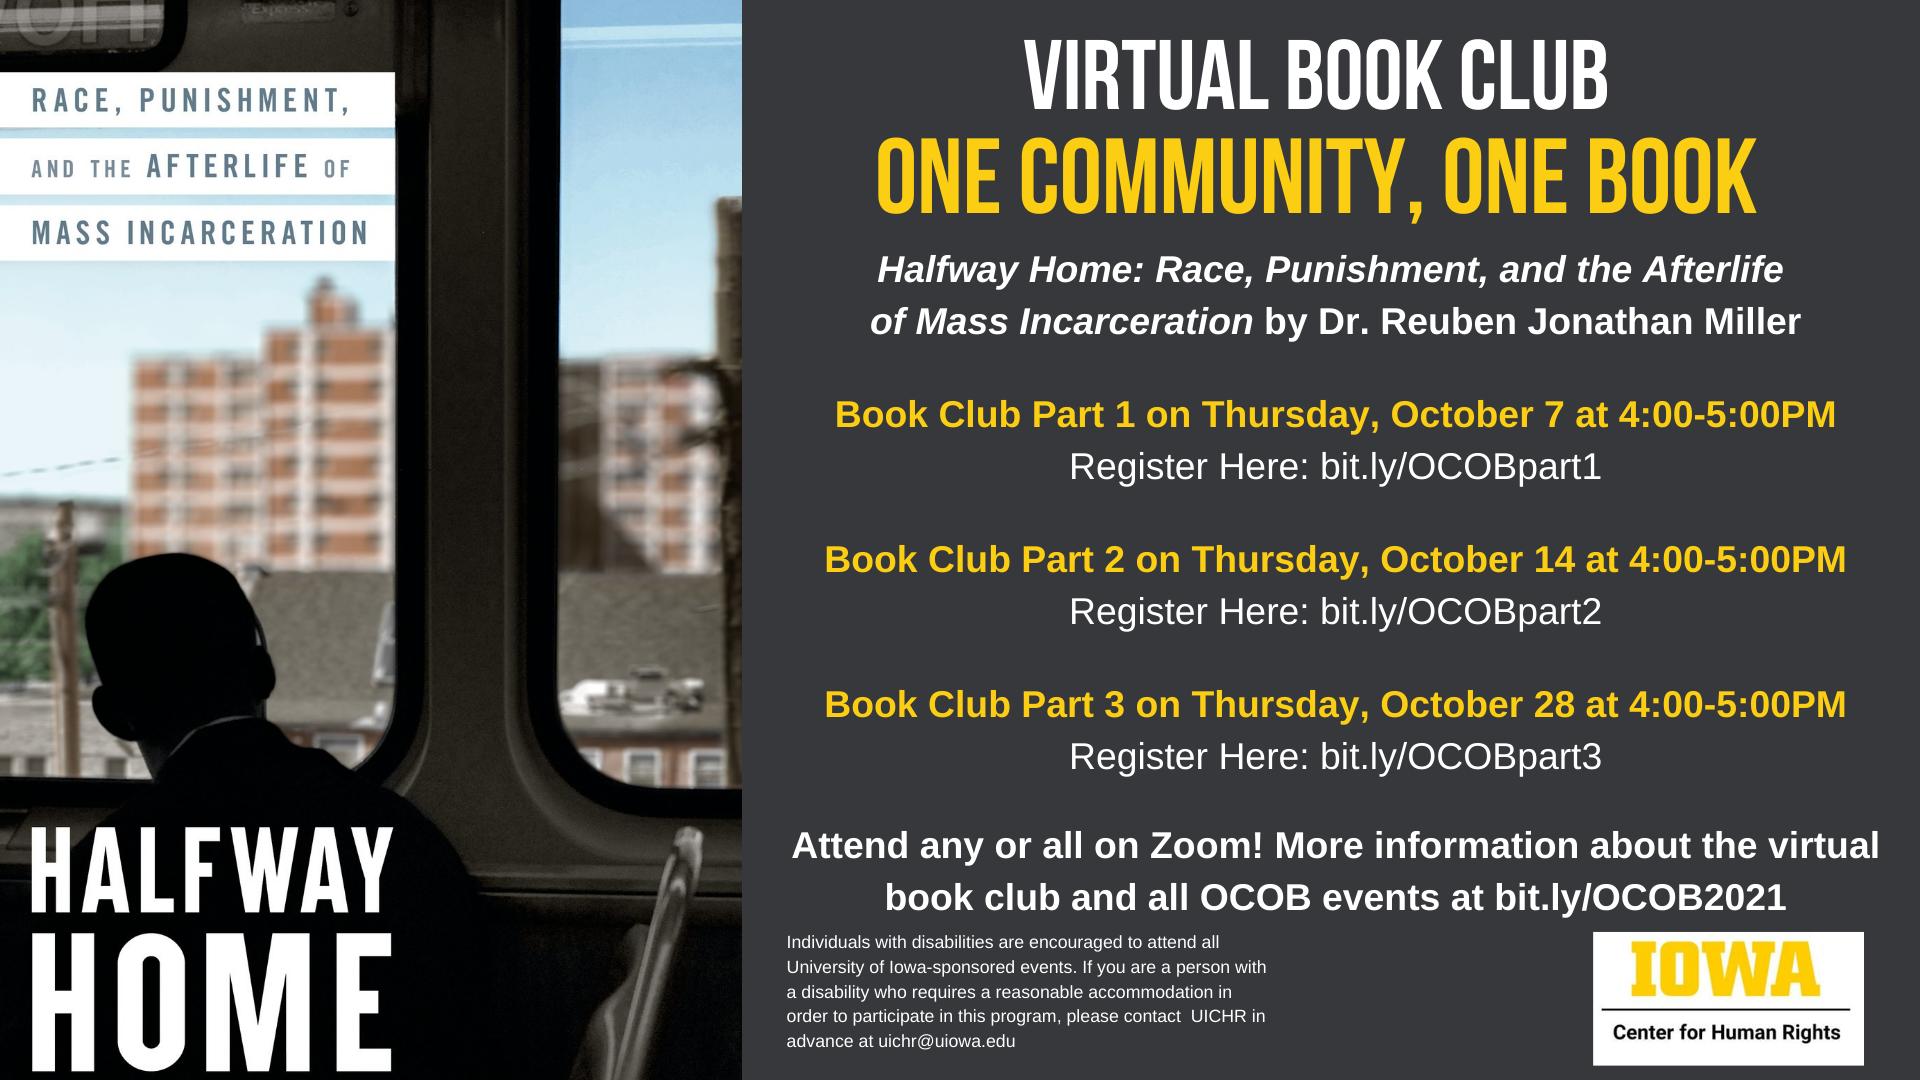 book club information